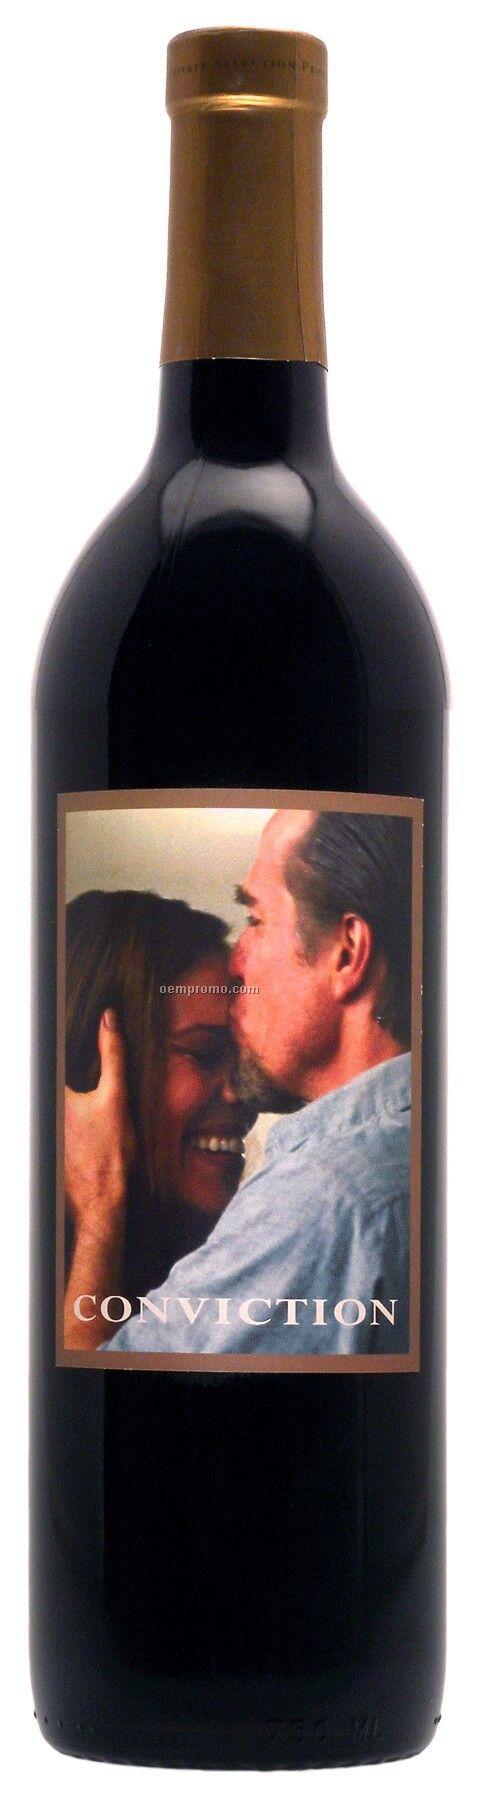 750ml Standard Cabernet Sauvignon Wine With Label